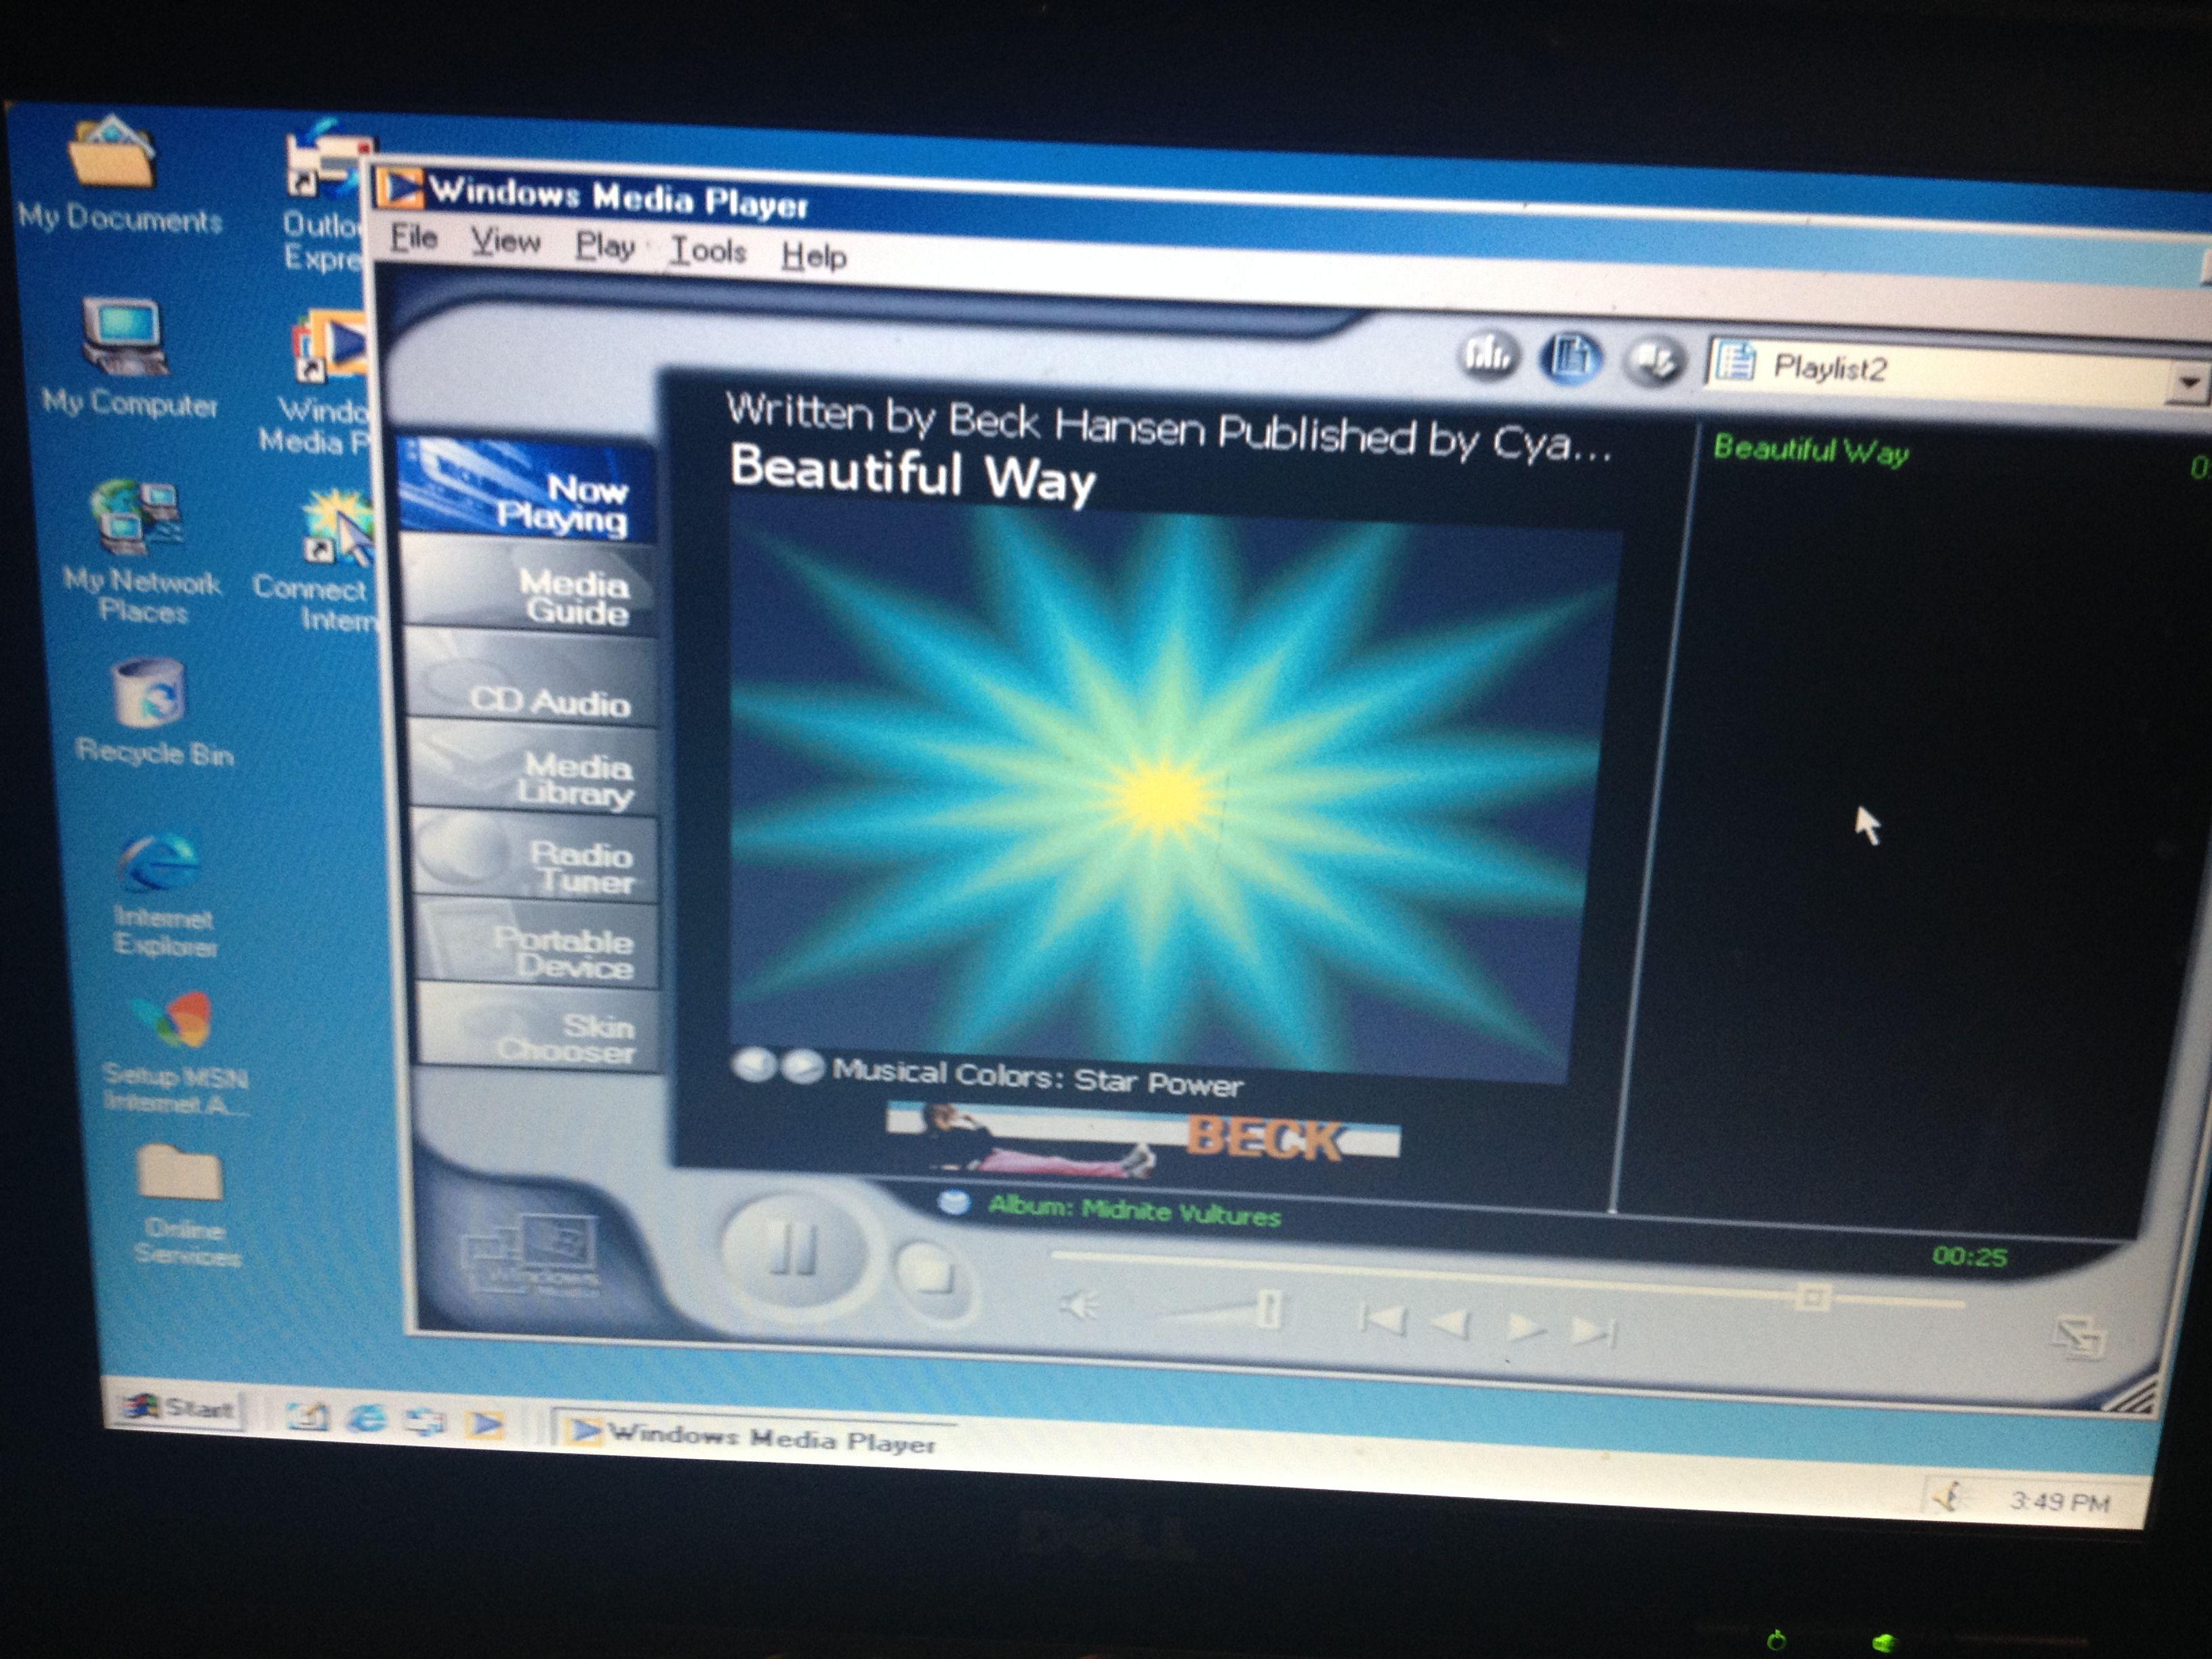 Windows Media Player 7 Now Playing | Windows Media Player ...